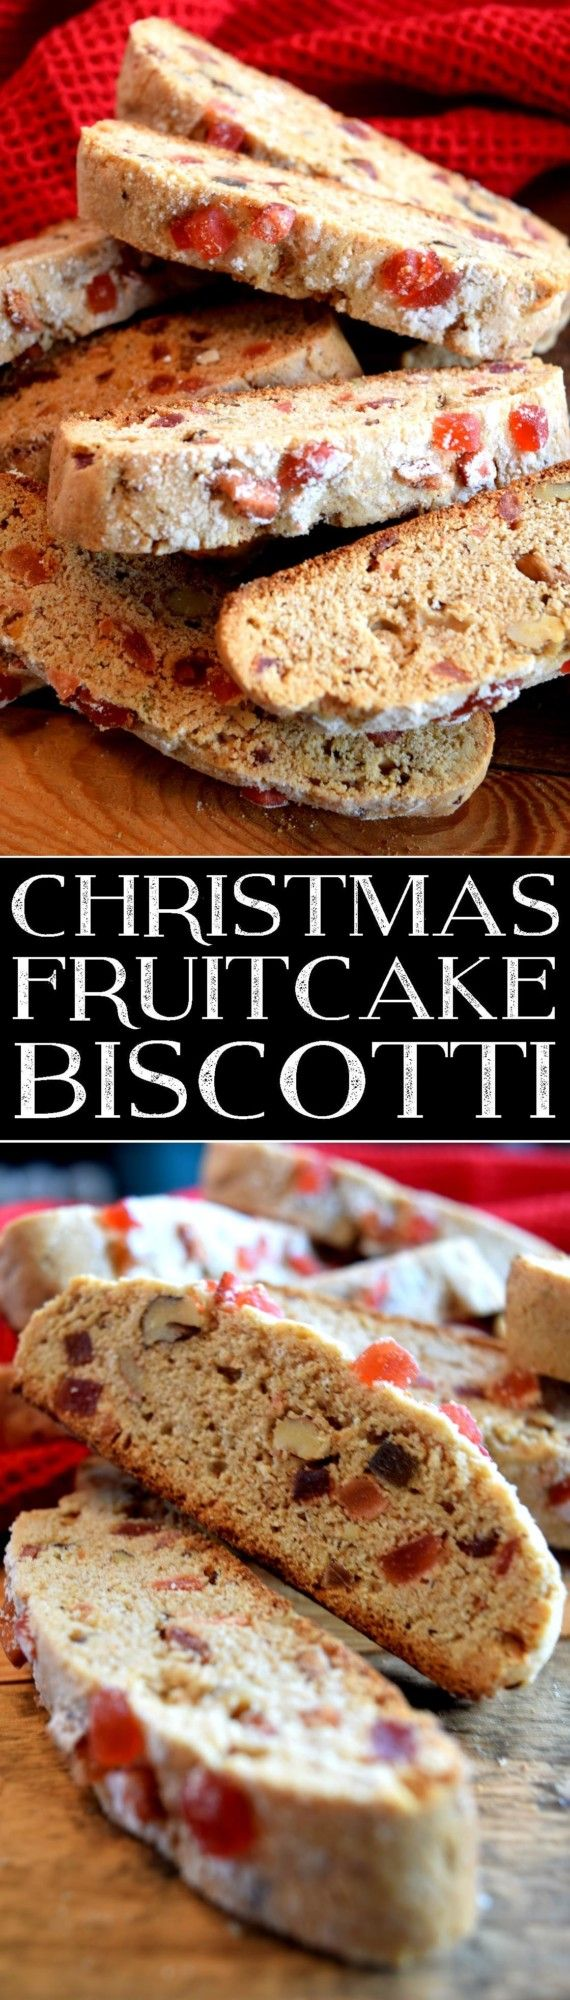 christmas-fruitcake-biscotti